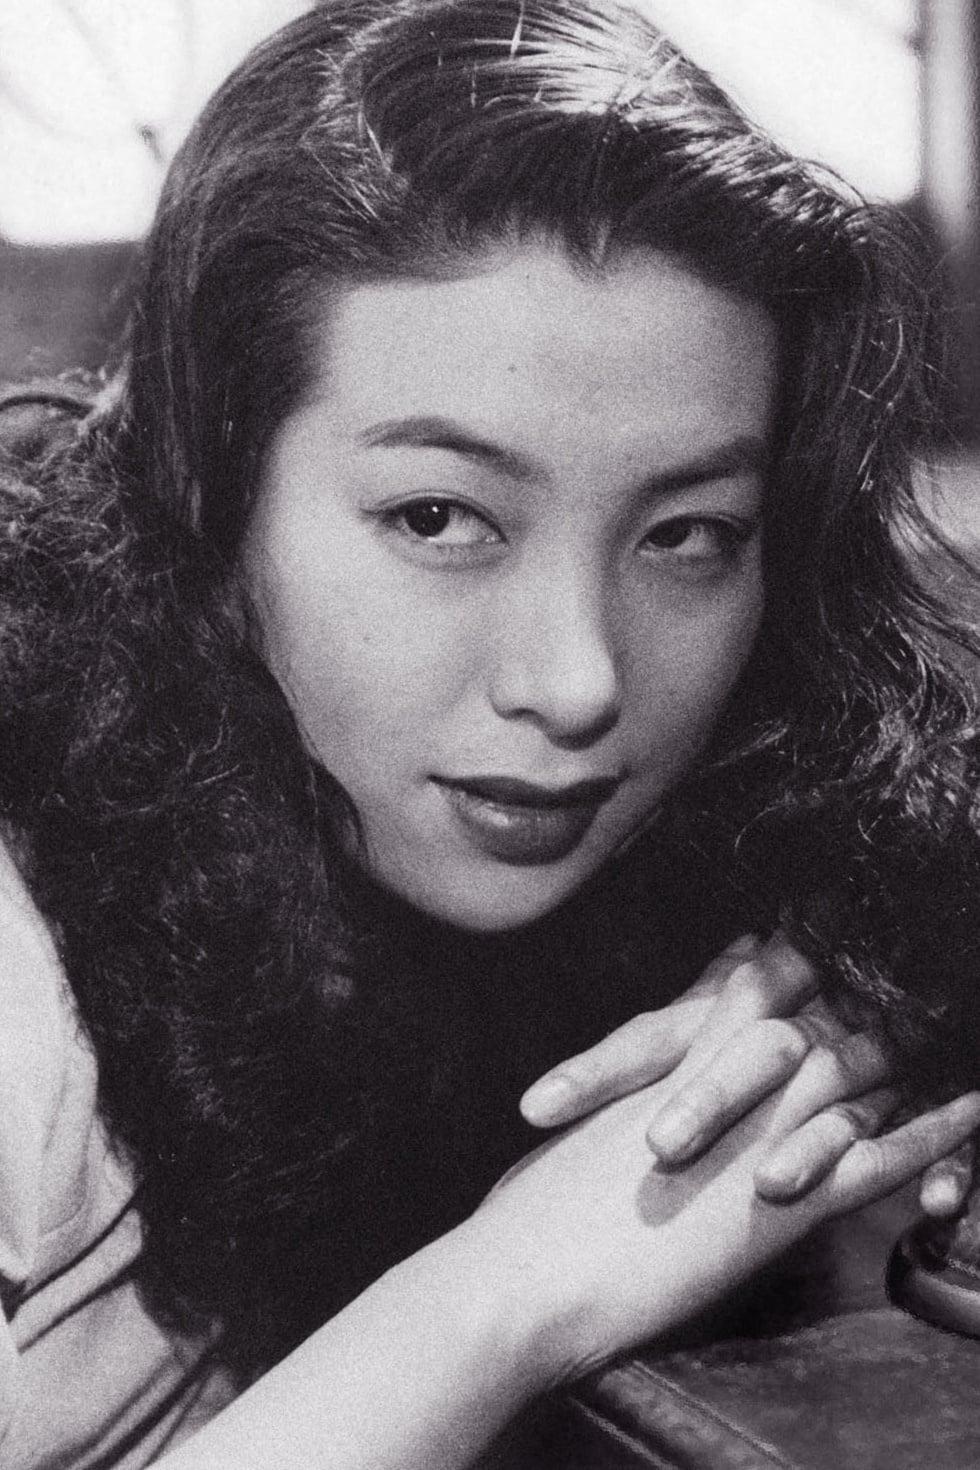 Michiyo Aratama